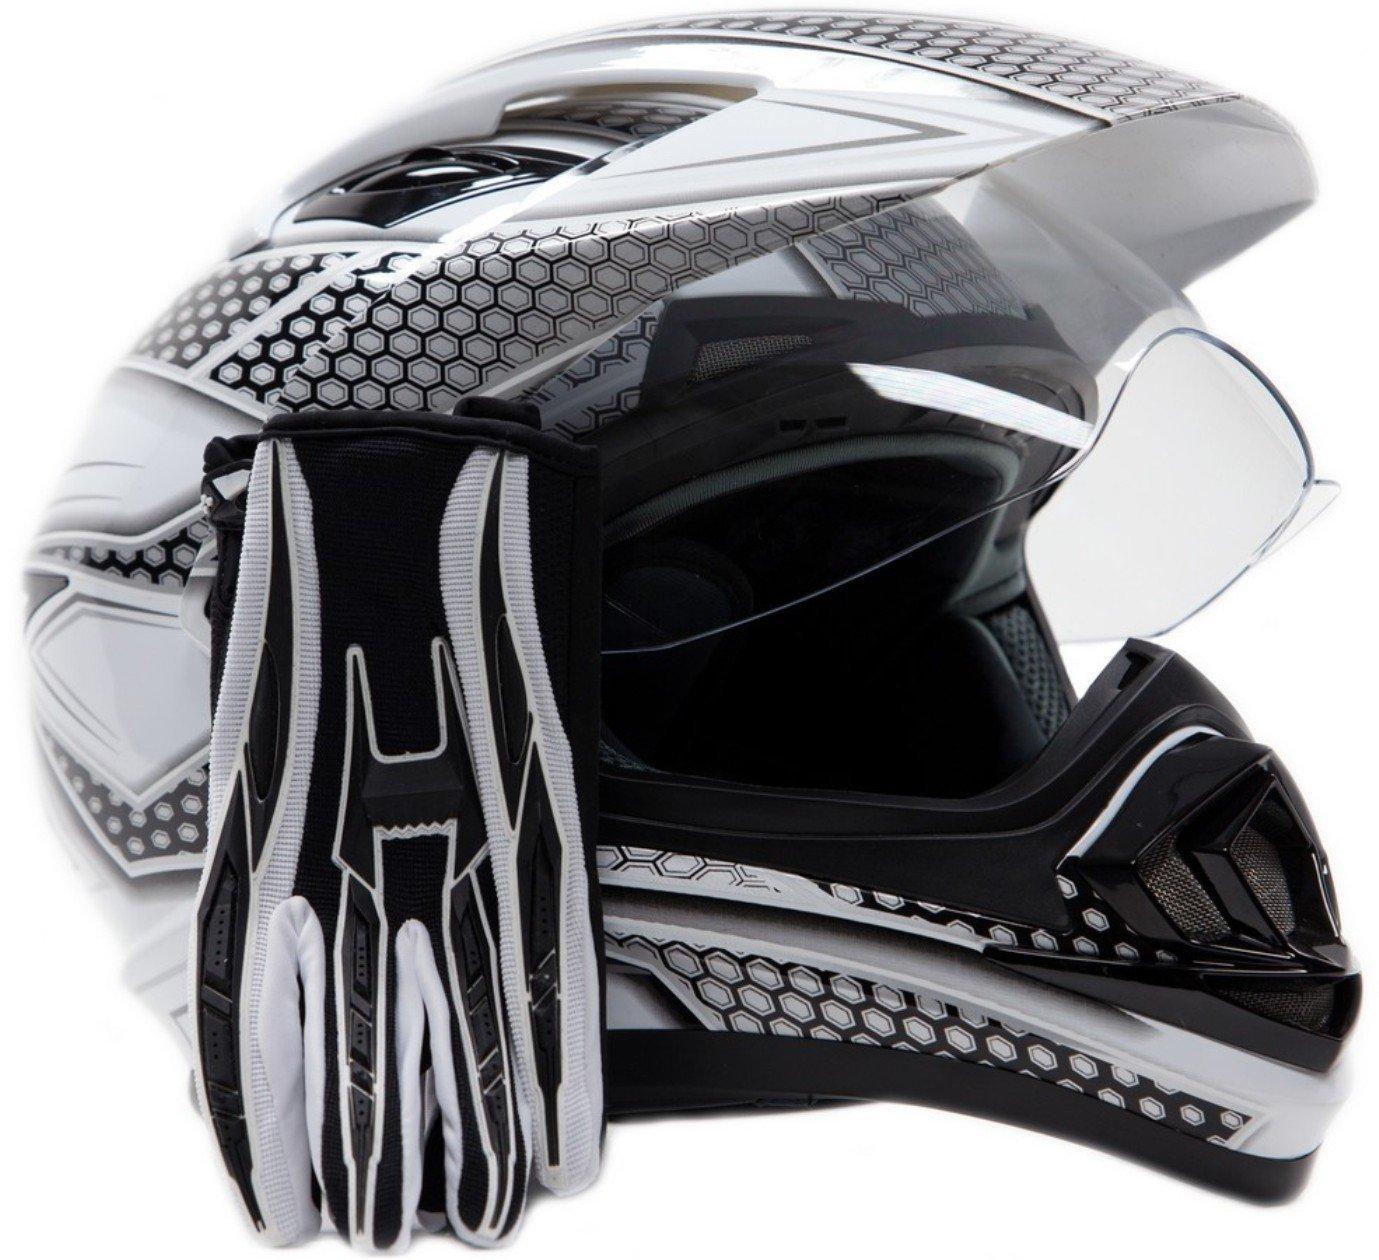 Dual Sport Helmet Combo w/Gloves - Off Road Motocross UTV ATV Motorcycle Enduro - Silver, Black - XXL